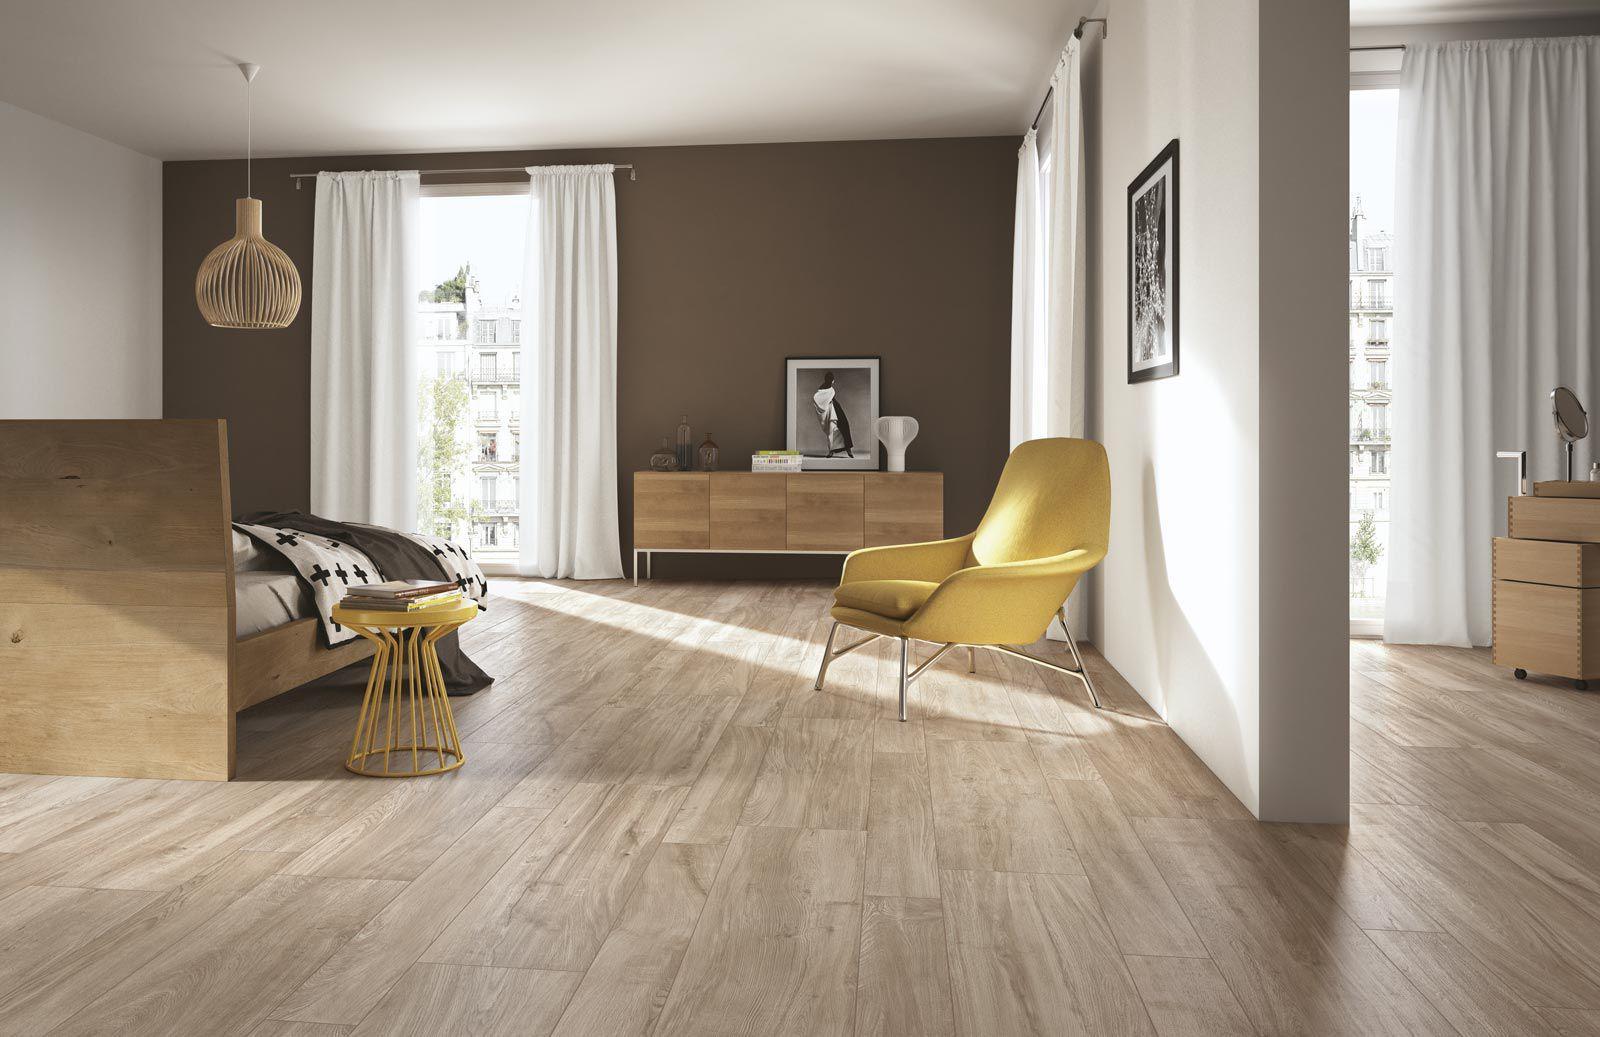 Pavimento Effetto Parquet Marazzi indoor tile / wall / floor / porcelain stoneware